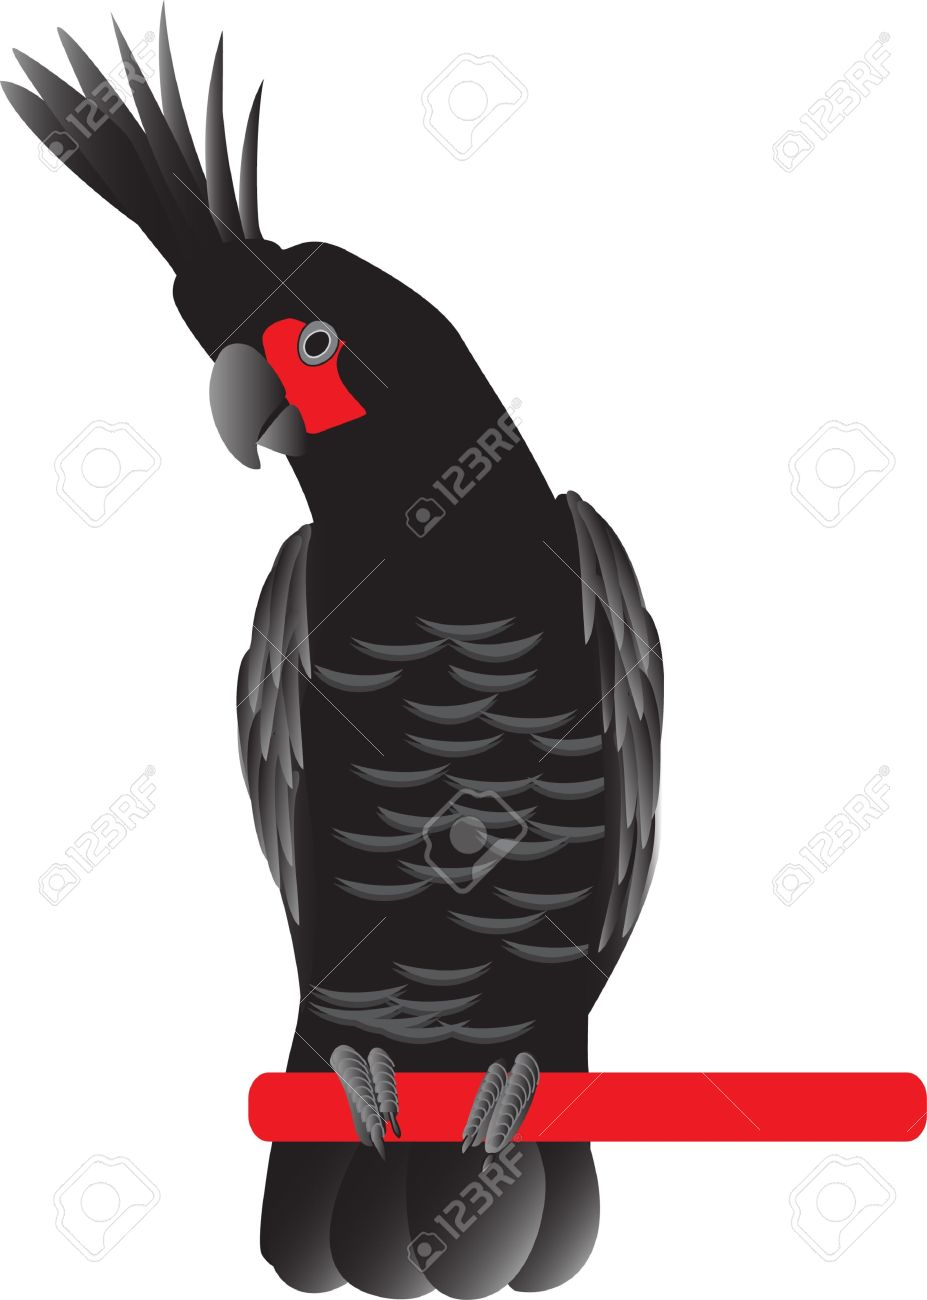 Cockatoo clipart #1 Palm Palm Cockatoo clipart